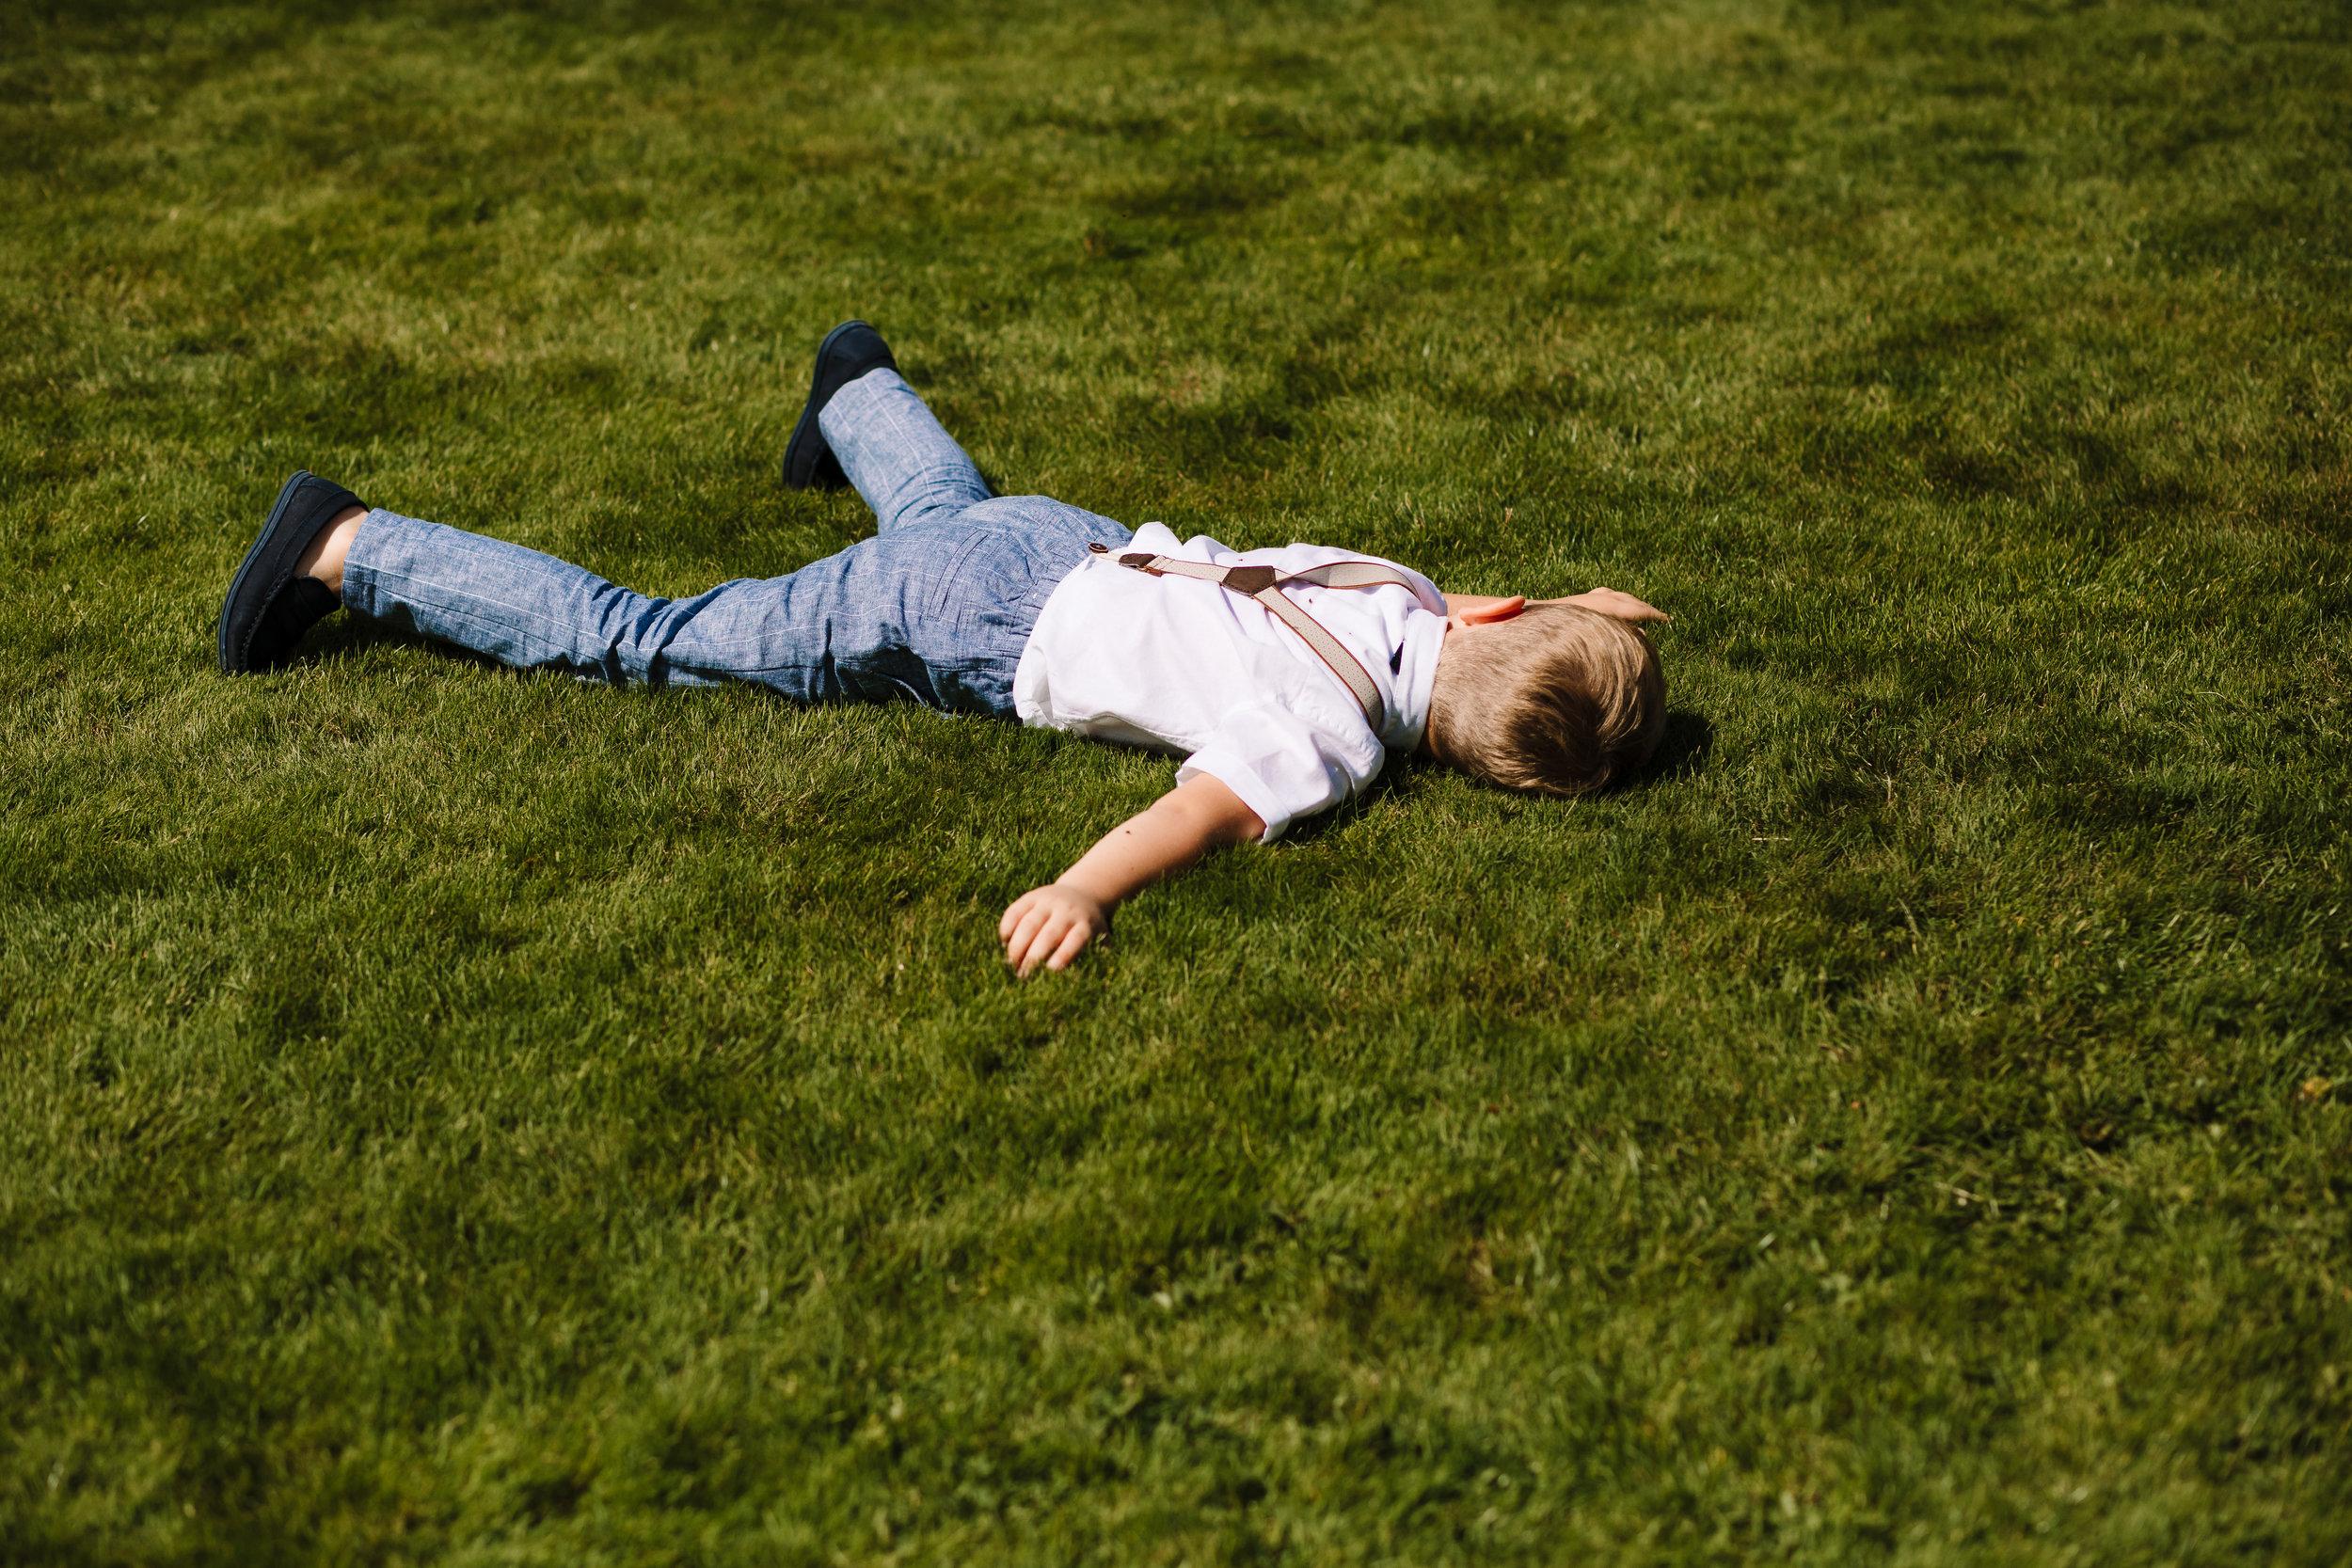 A little boy lying face down on the grass at an outdoor wedding